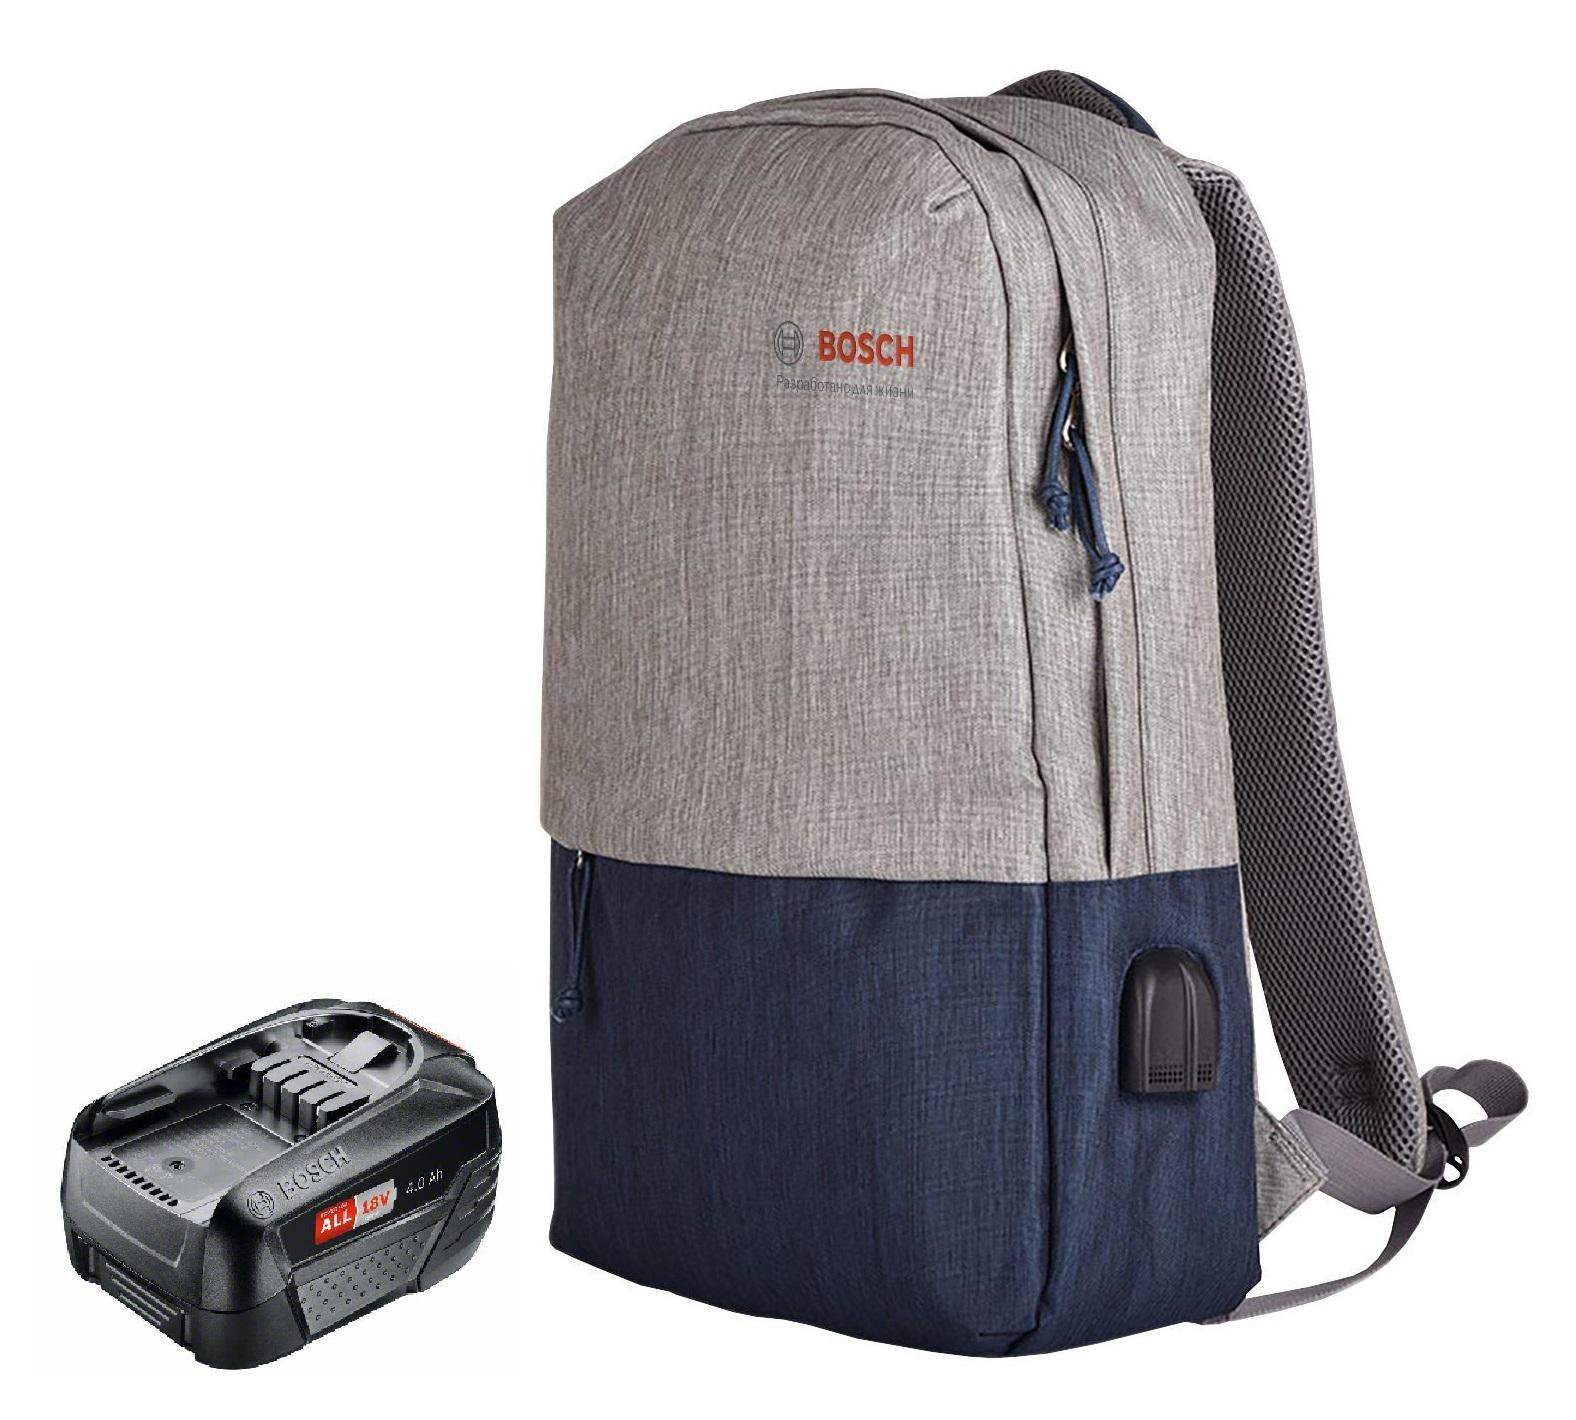 Фото - Набор Bosch Аккумулятор 18В 4Ач li-ion pba (1600a011t8) +Рюкзак 1.619.m00.k04 набор bosch дрель аккумуляторная universaldrill 18 2акк и зу 06039c8005 рюкзак 1 619 m00 k04